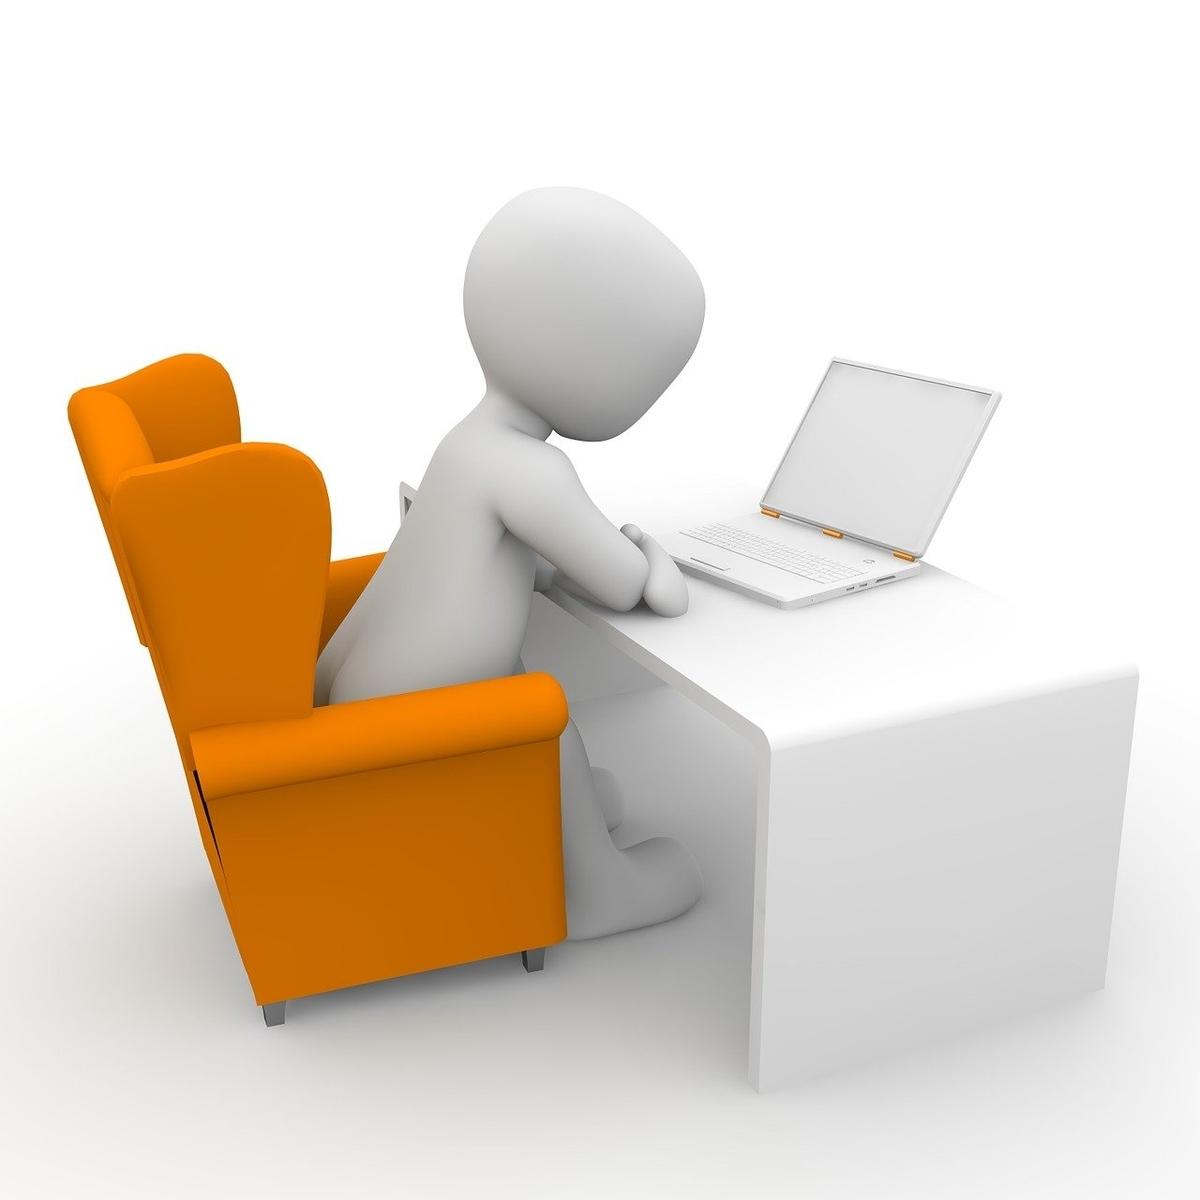 f:id:accounting-girl:20201213215212j:plain